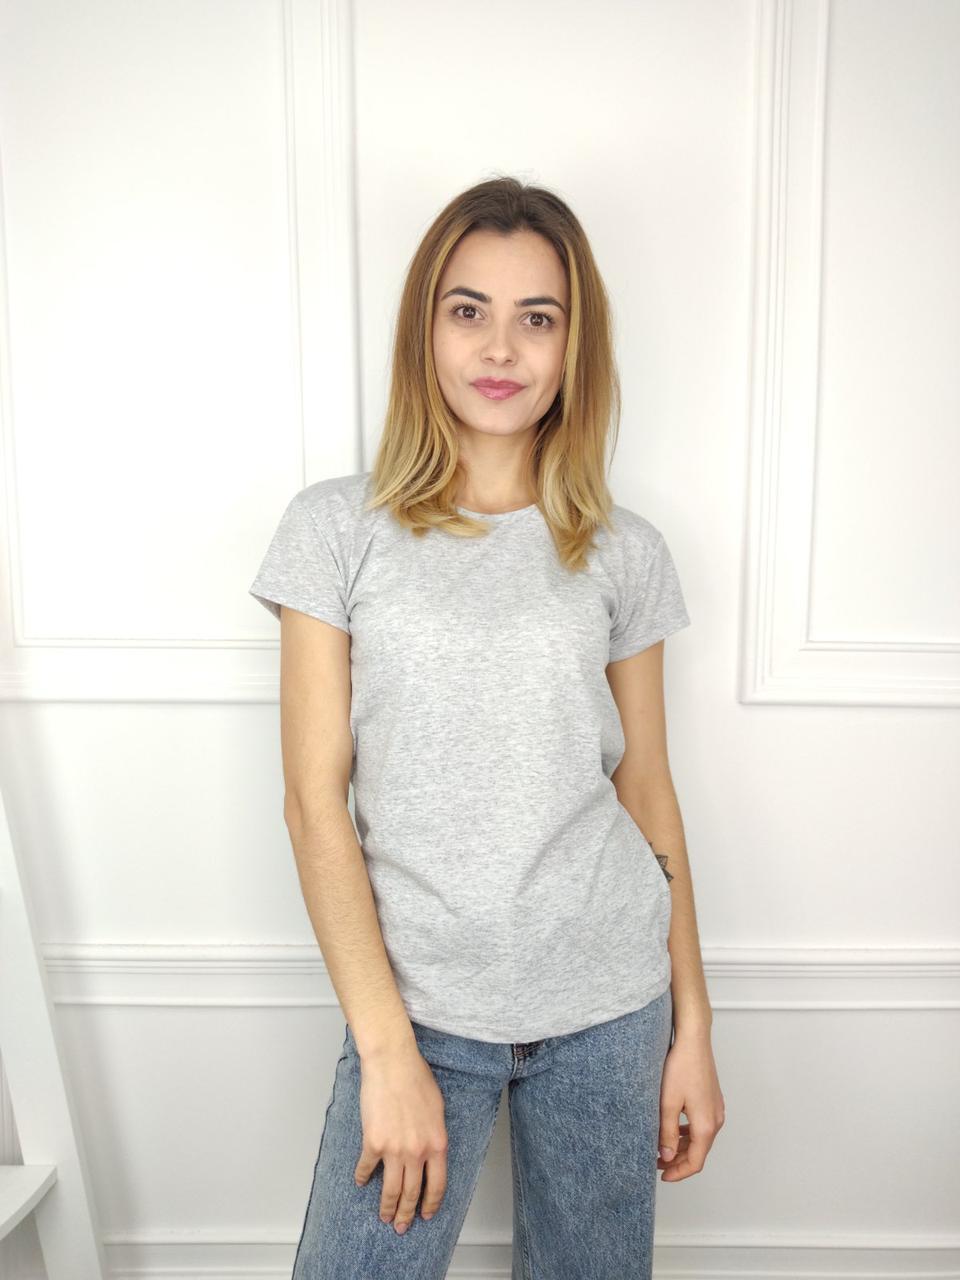 Женская футболка норма, 44-46-48рр, однотонная, серый